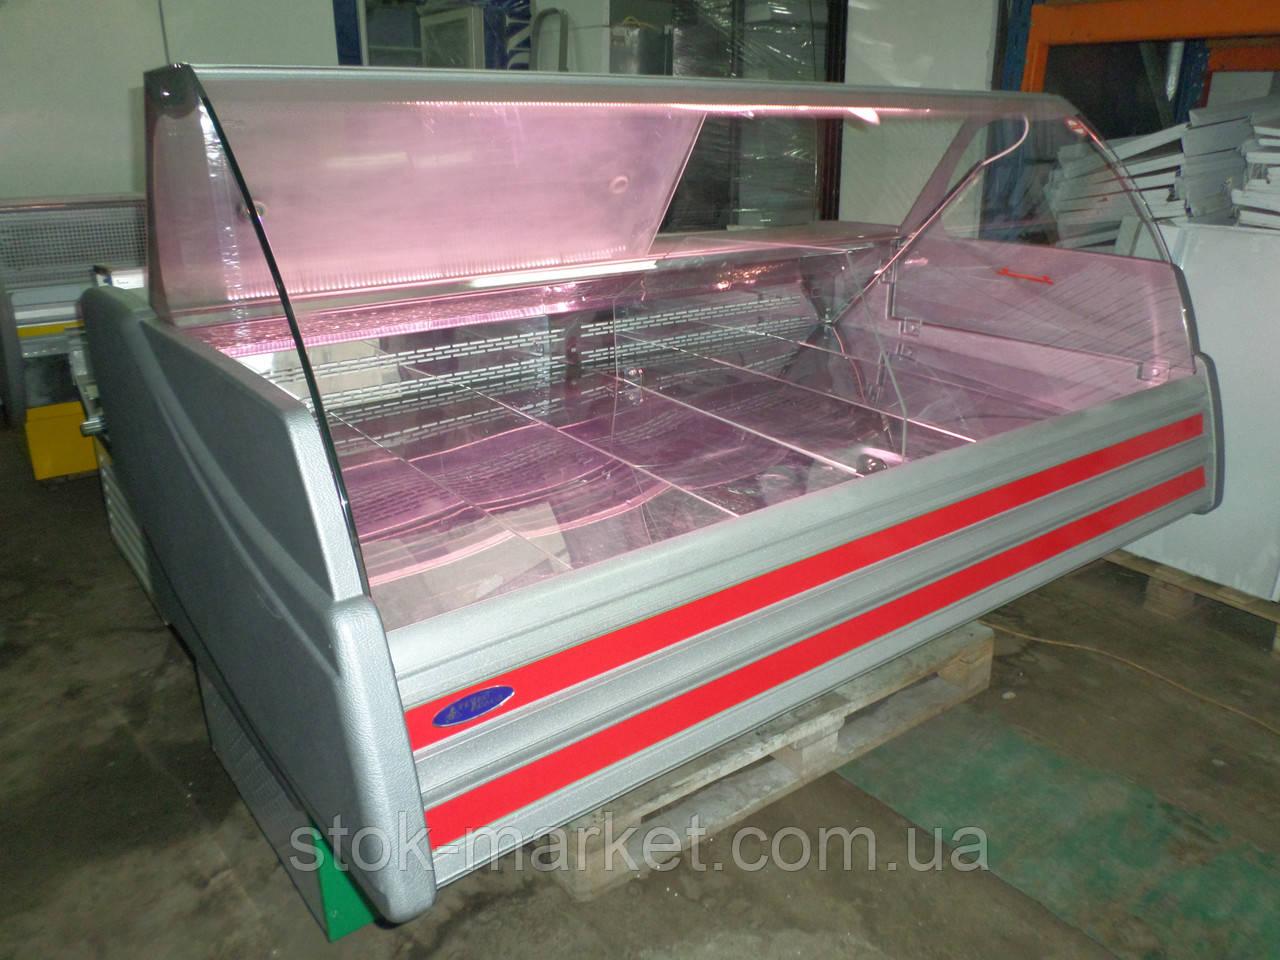 Холодильная витрина Технохолод 1,8 м. б/у, холодильная витрина б у, холодильный прилавок б у, холодильник б у